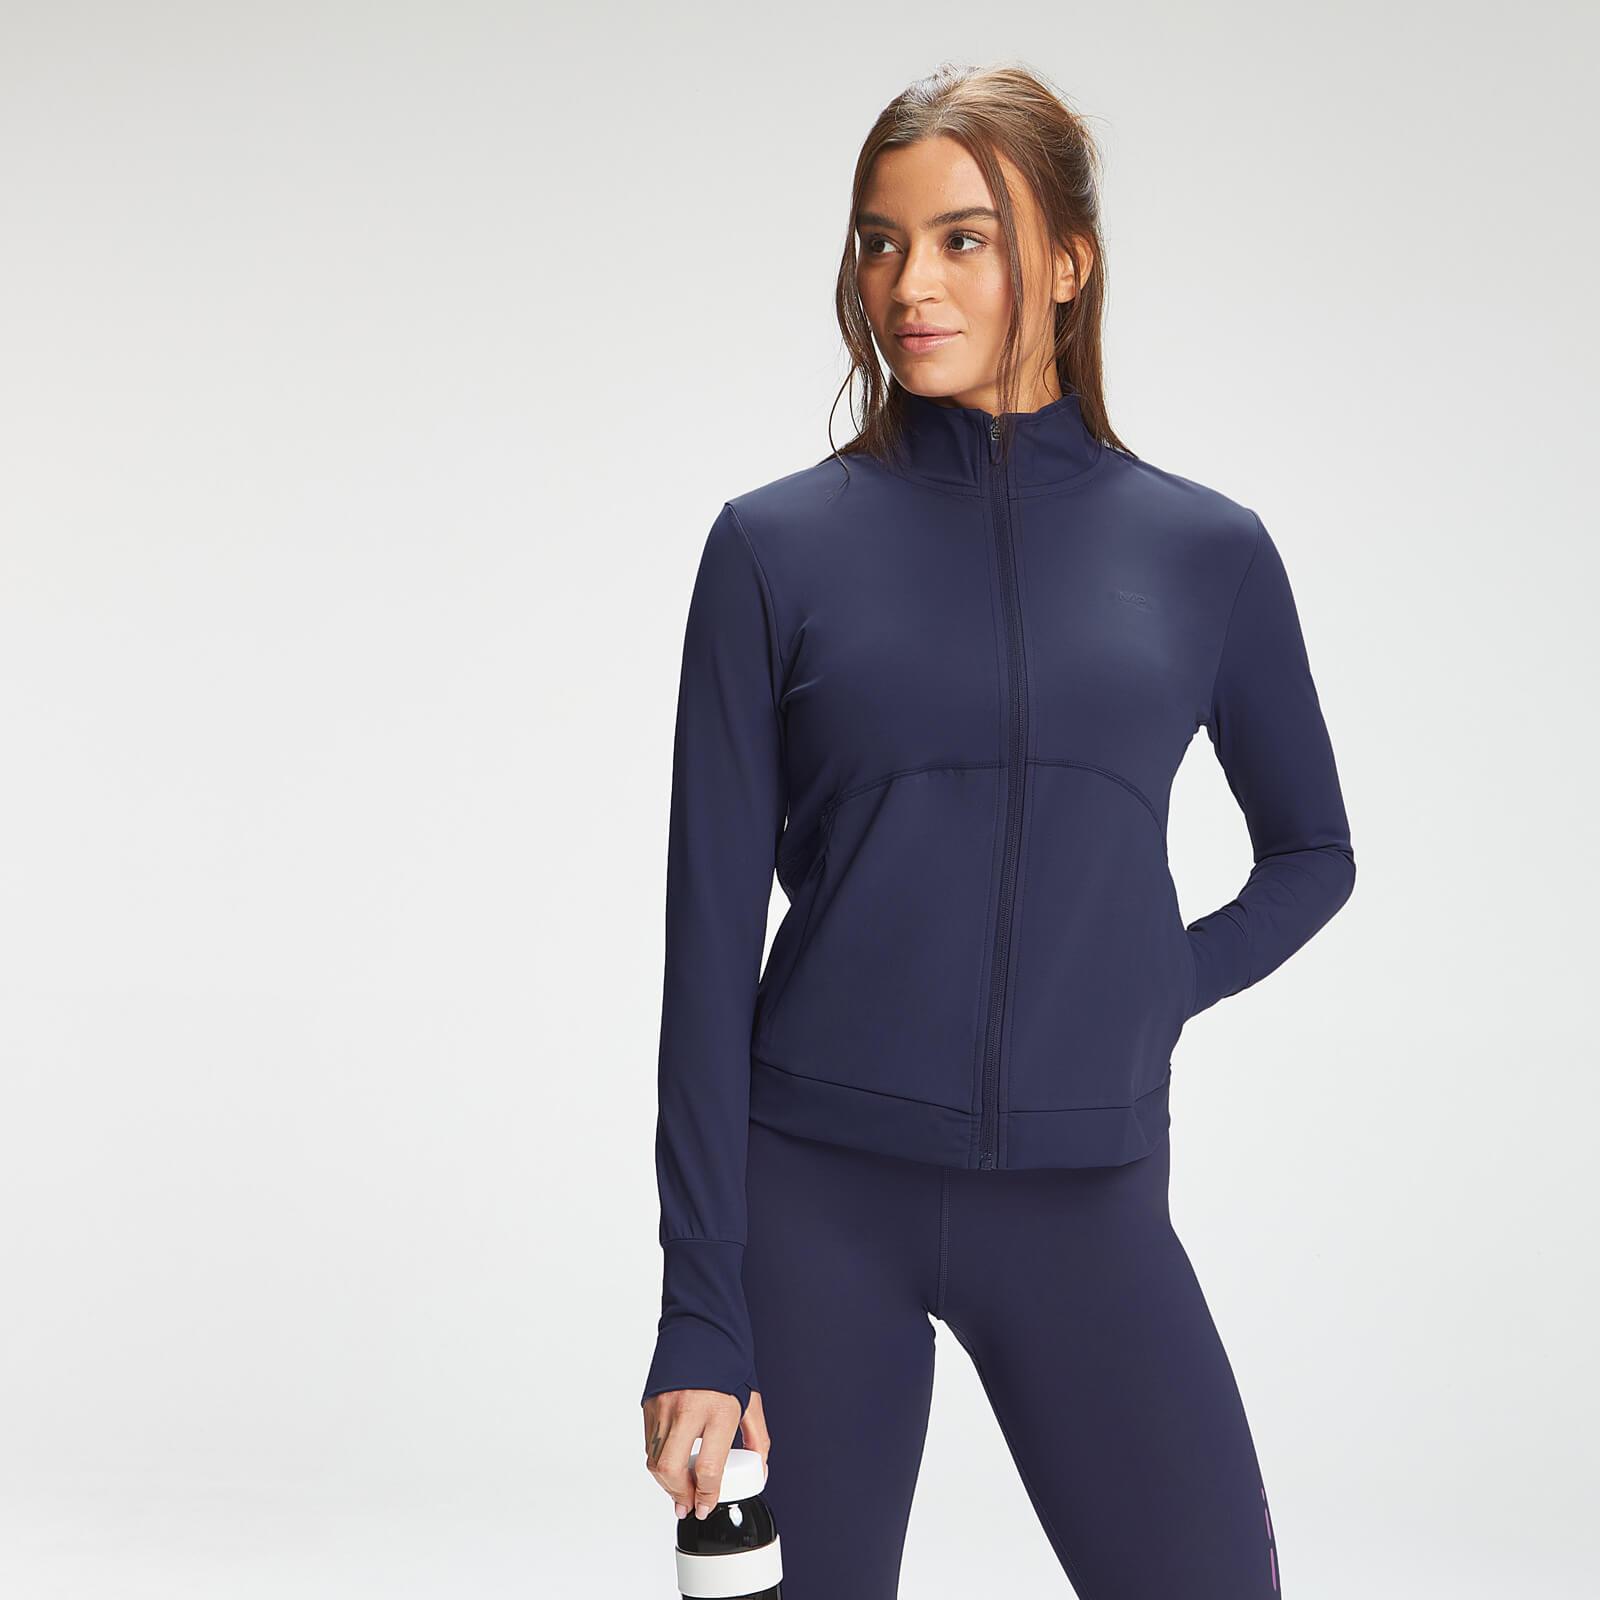 Купить MP Women's Power Ultra Regular Fit Jacket - Galaxy Blue - XS, Myprotein International